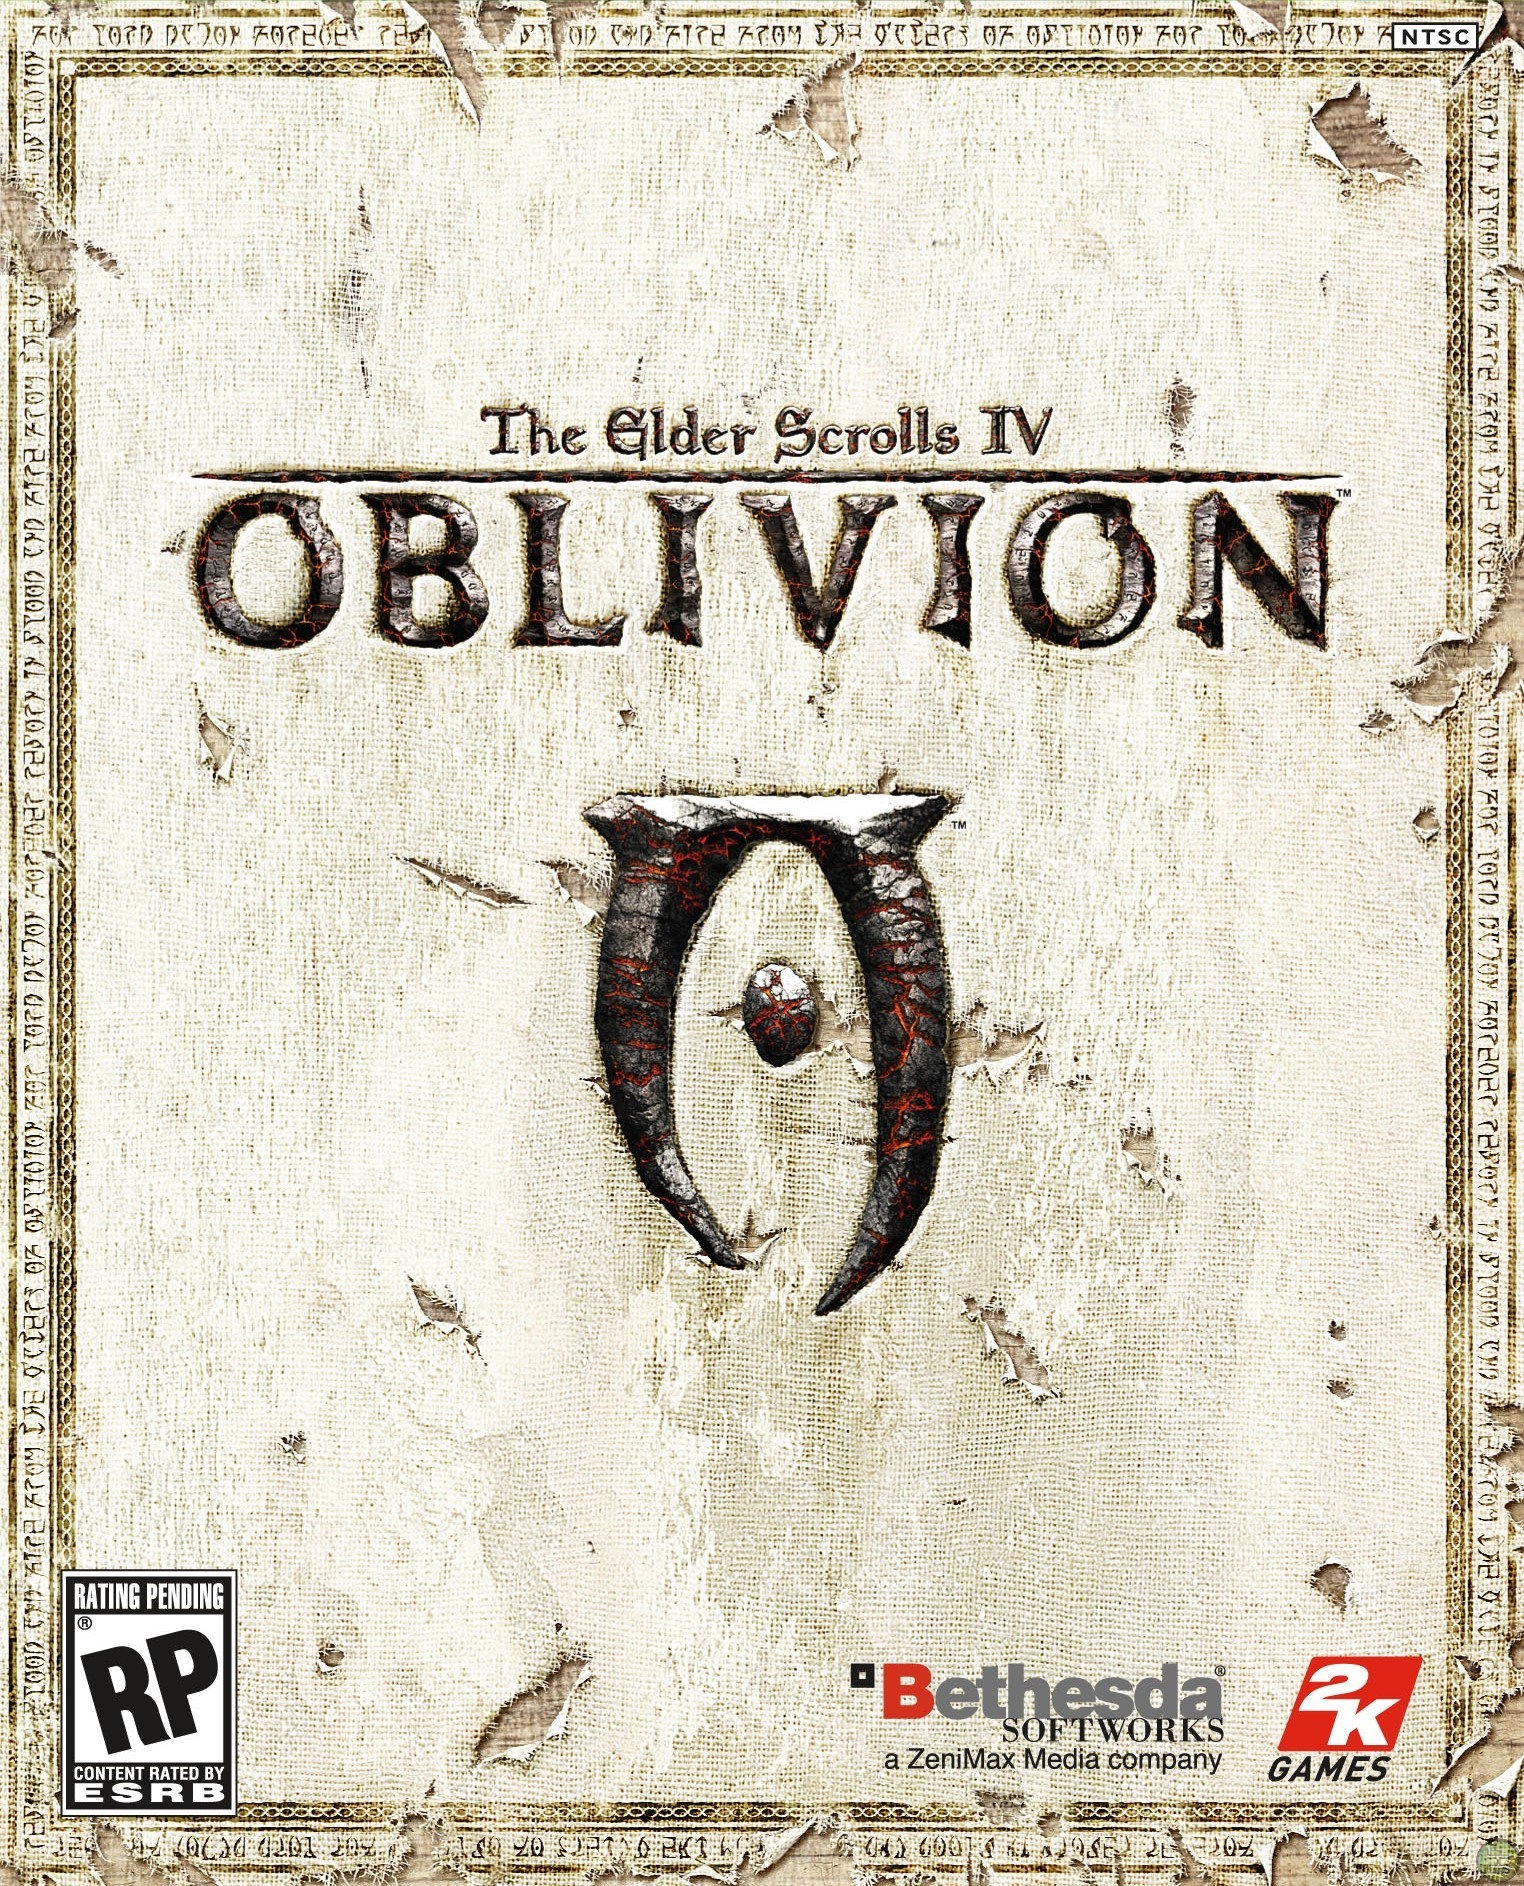 The Elder Scrolls IV: Oblivion coloring #9, Download drawings